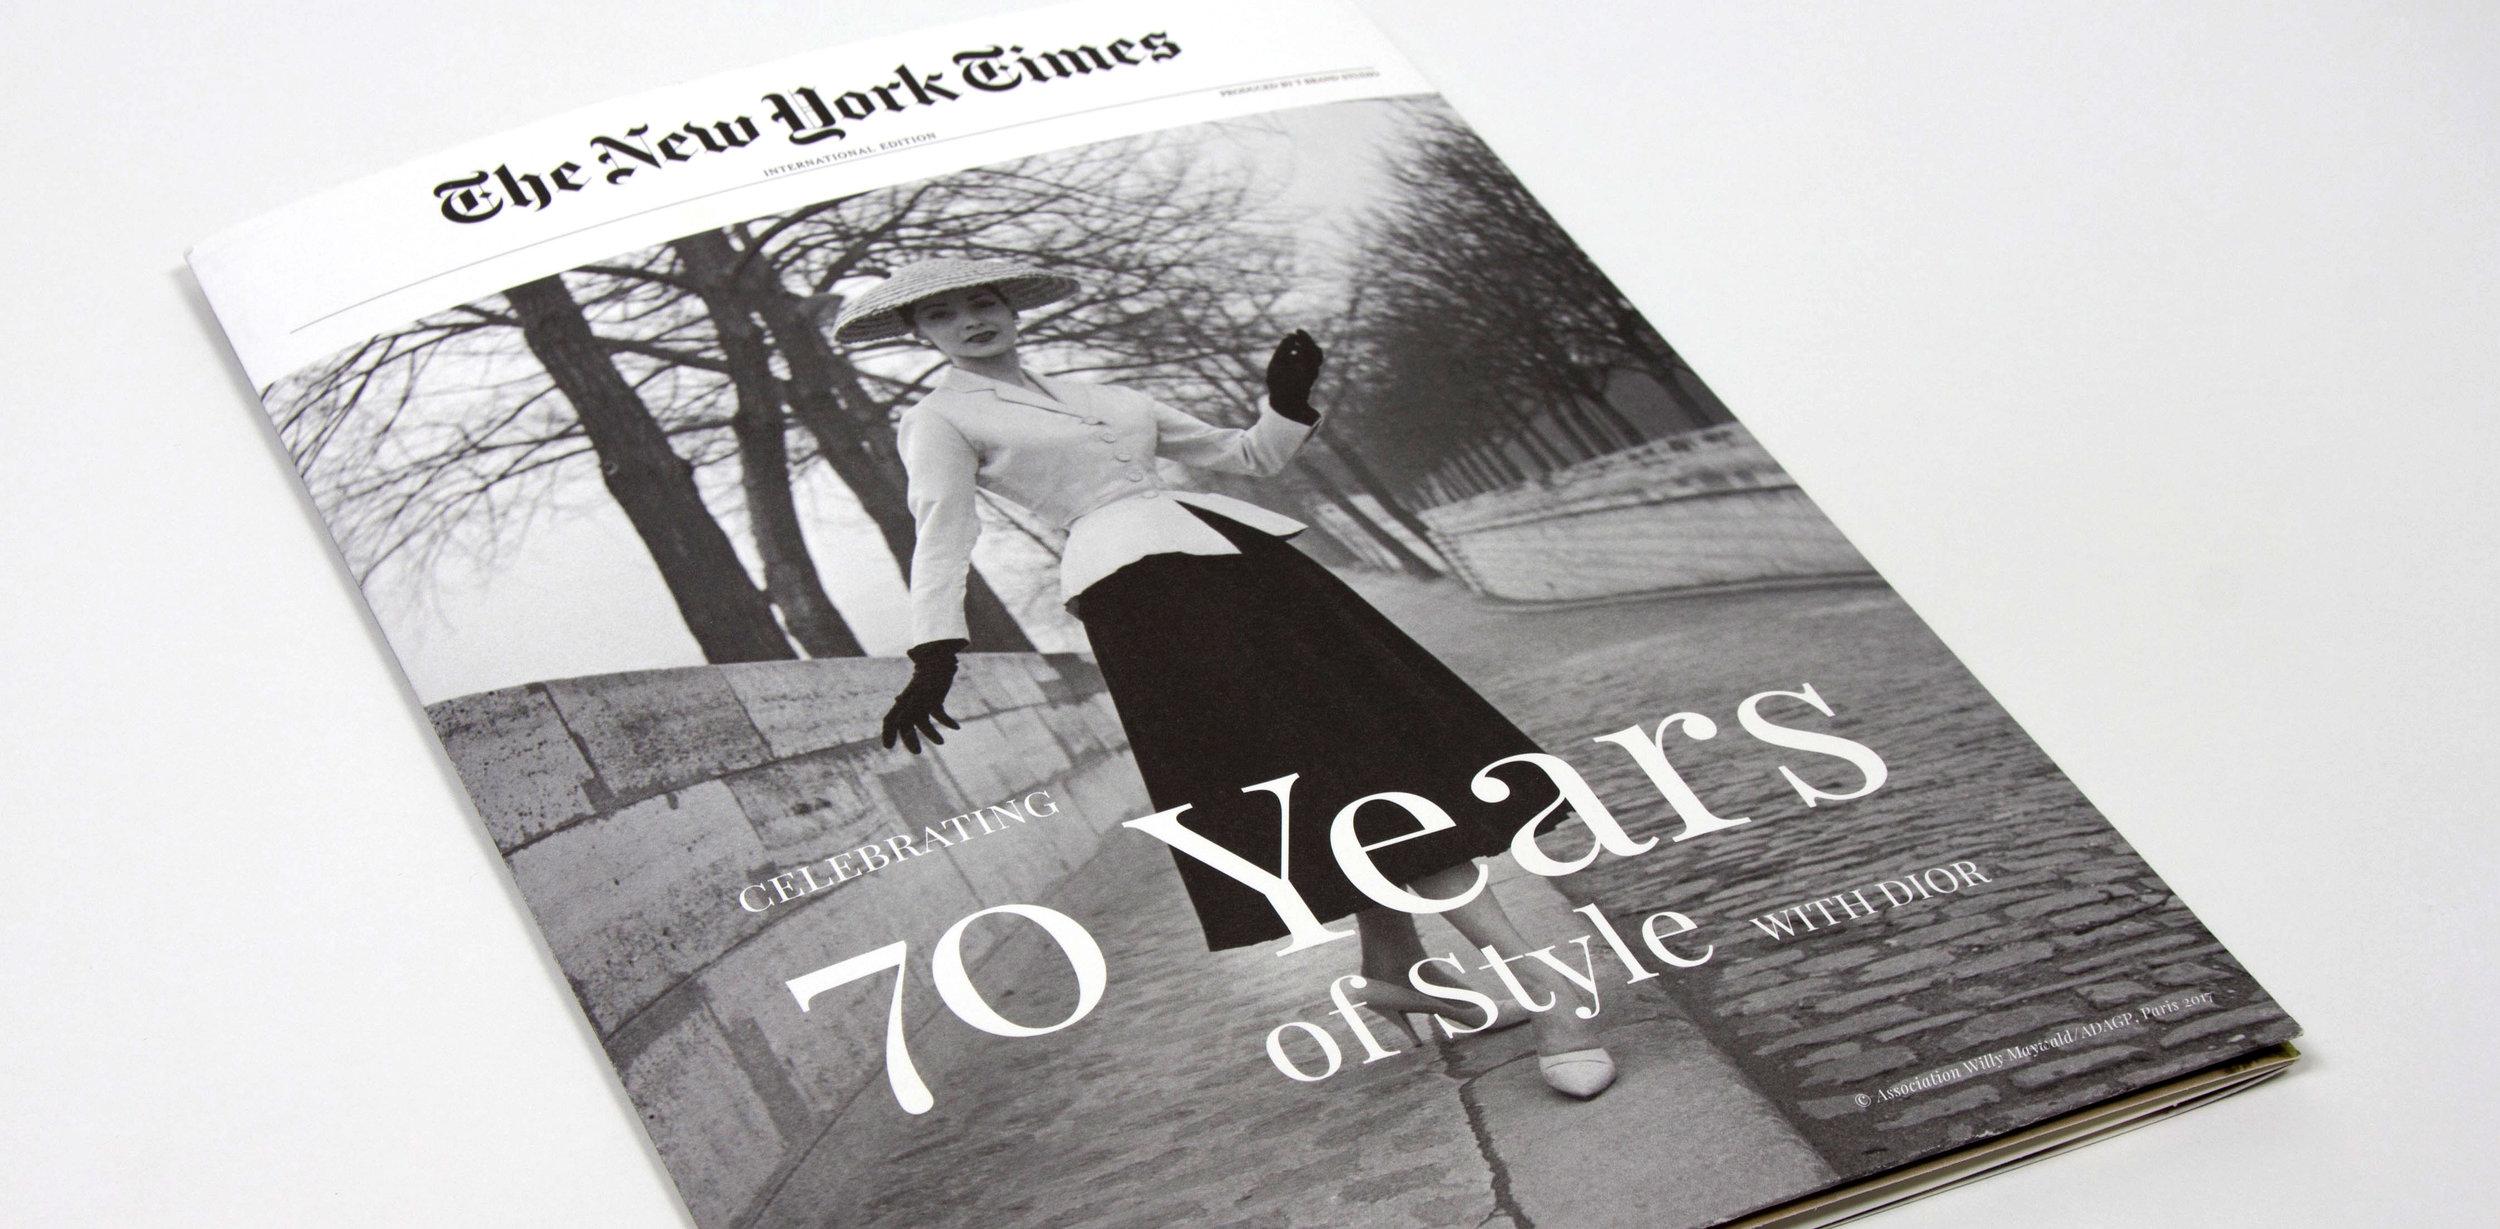 CBS_Website_Dior_Image02.jpg